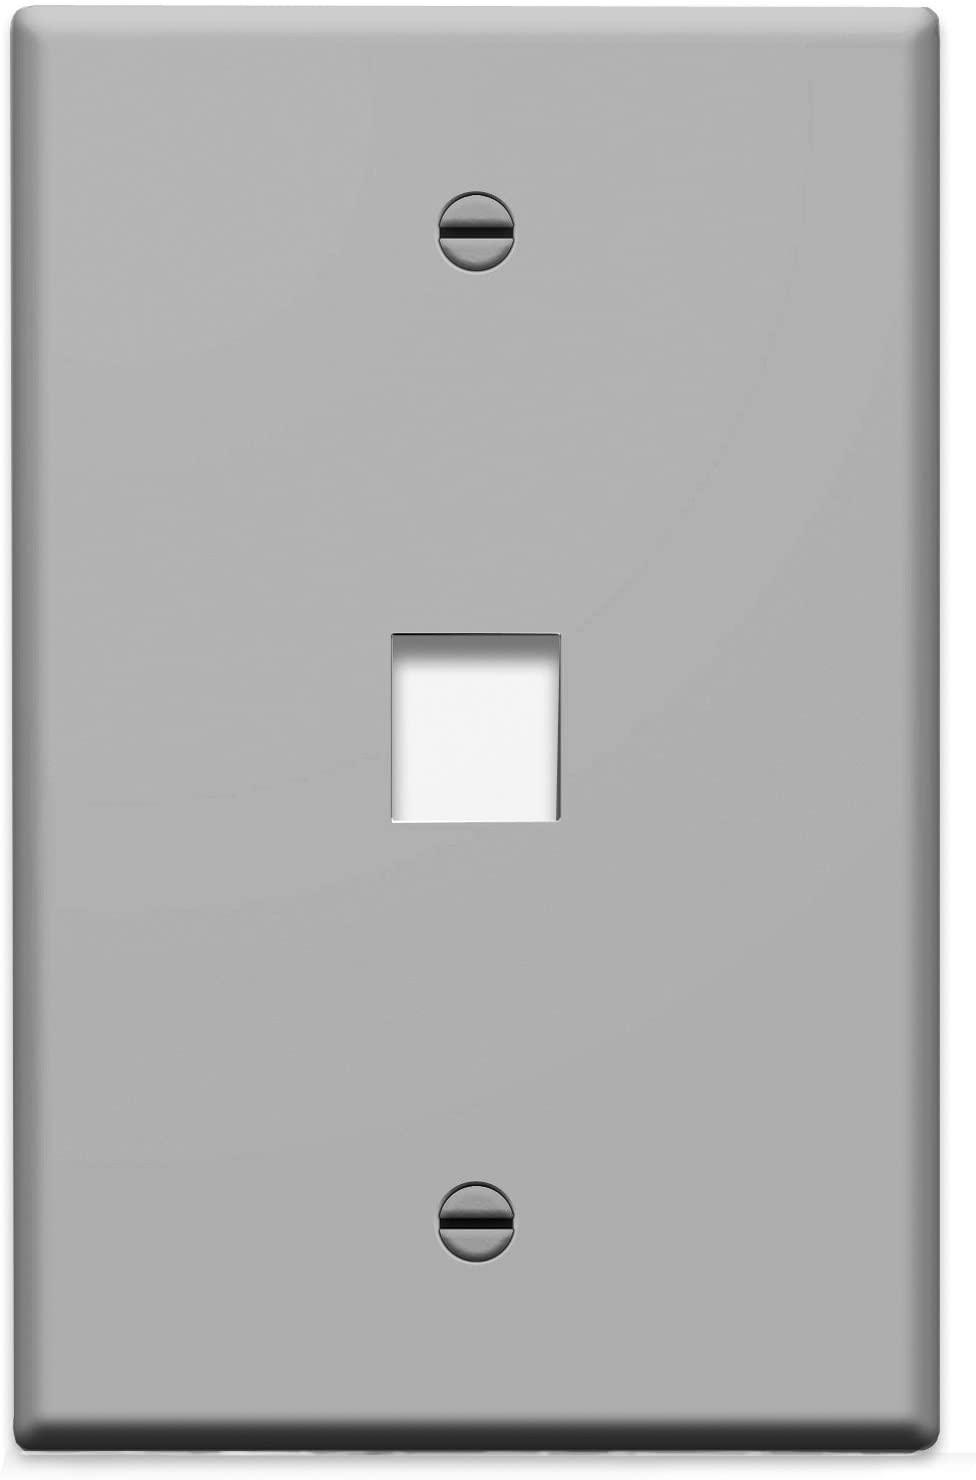 Legrand - On-Q WP3401GY 1 Port Single Gang Wall Plate, Gray